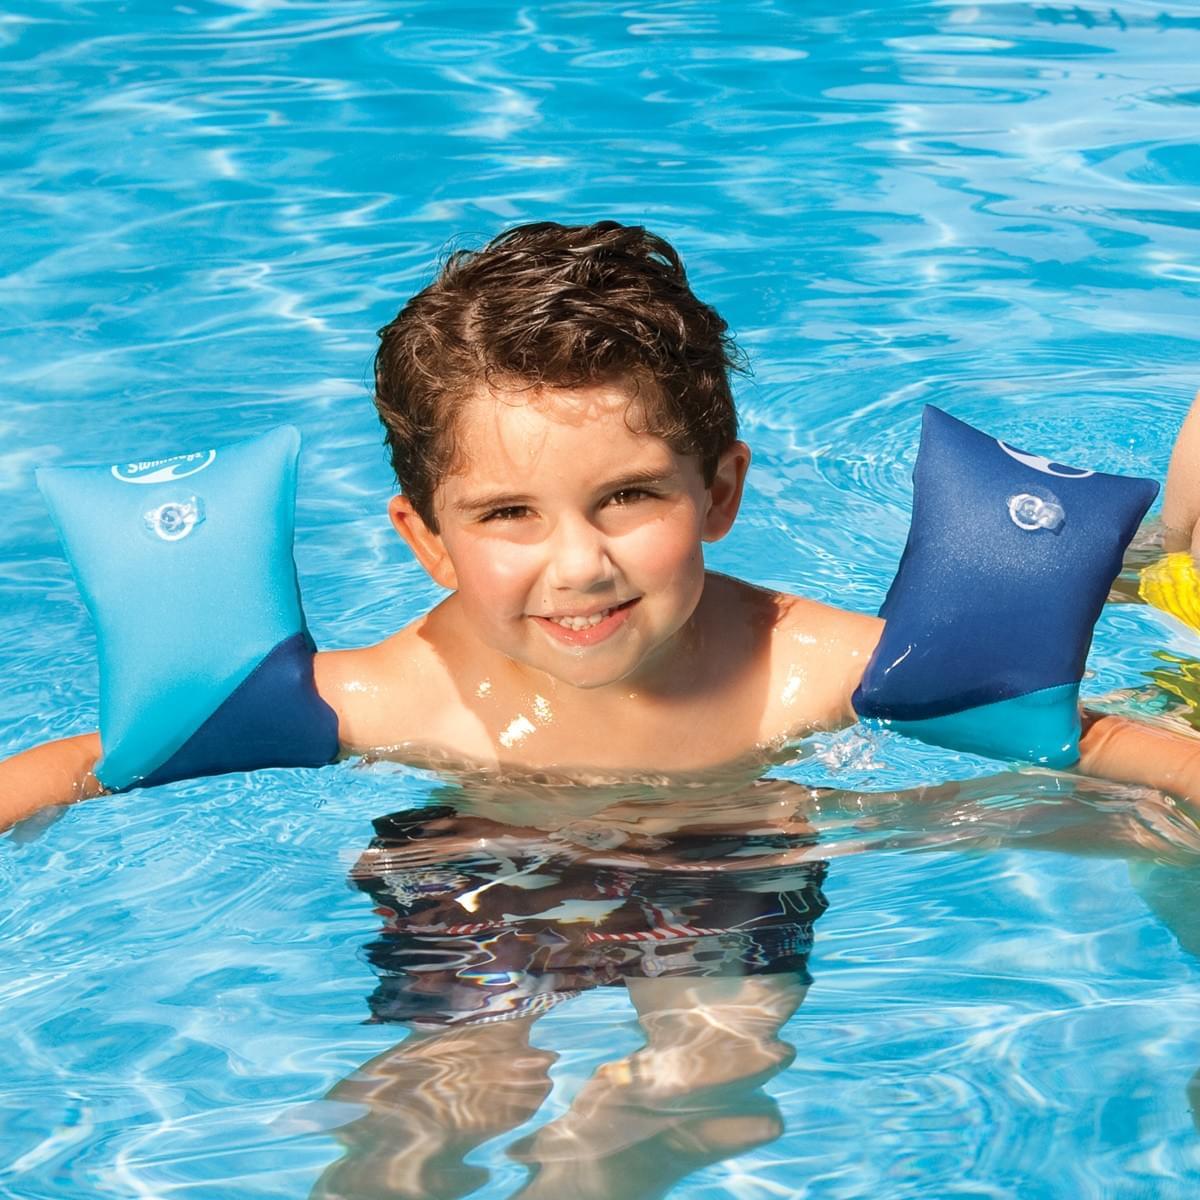 Swimways soft swimmies arm floaties pool supplies canada - Can babies swim in saltwater pools ...